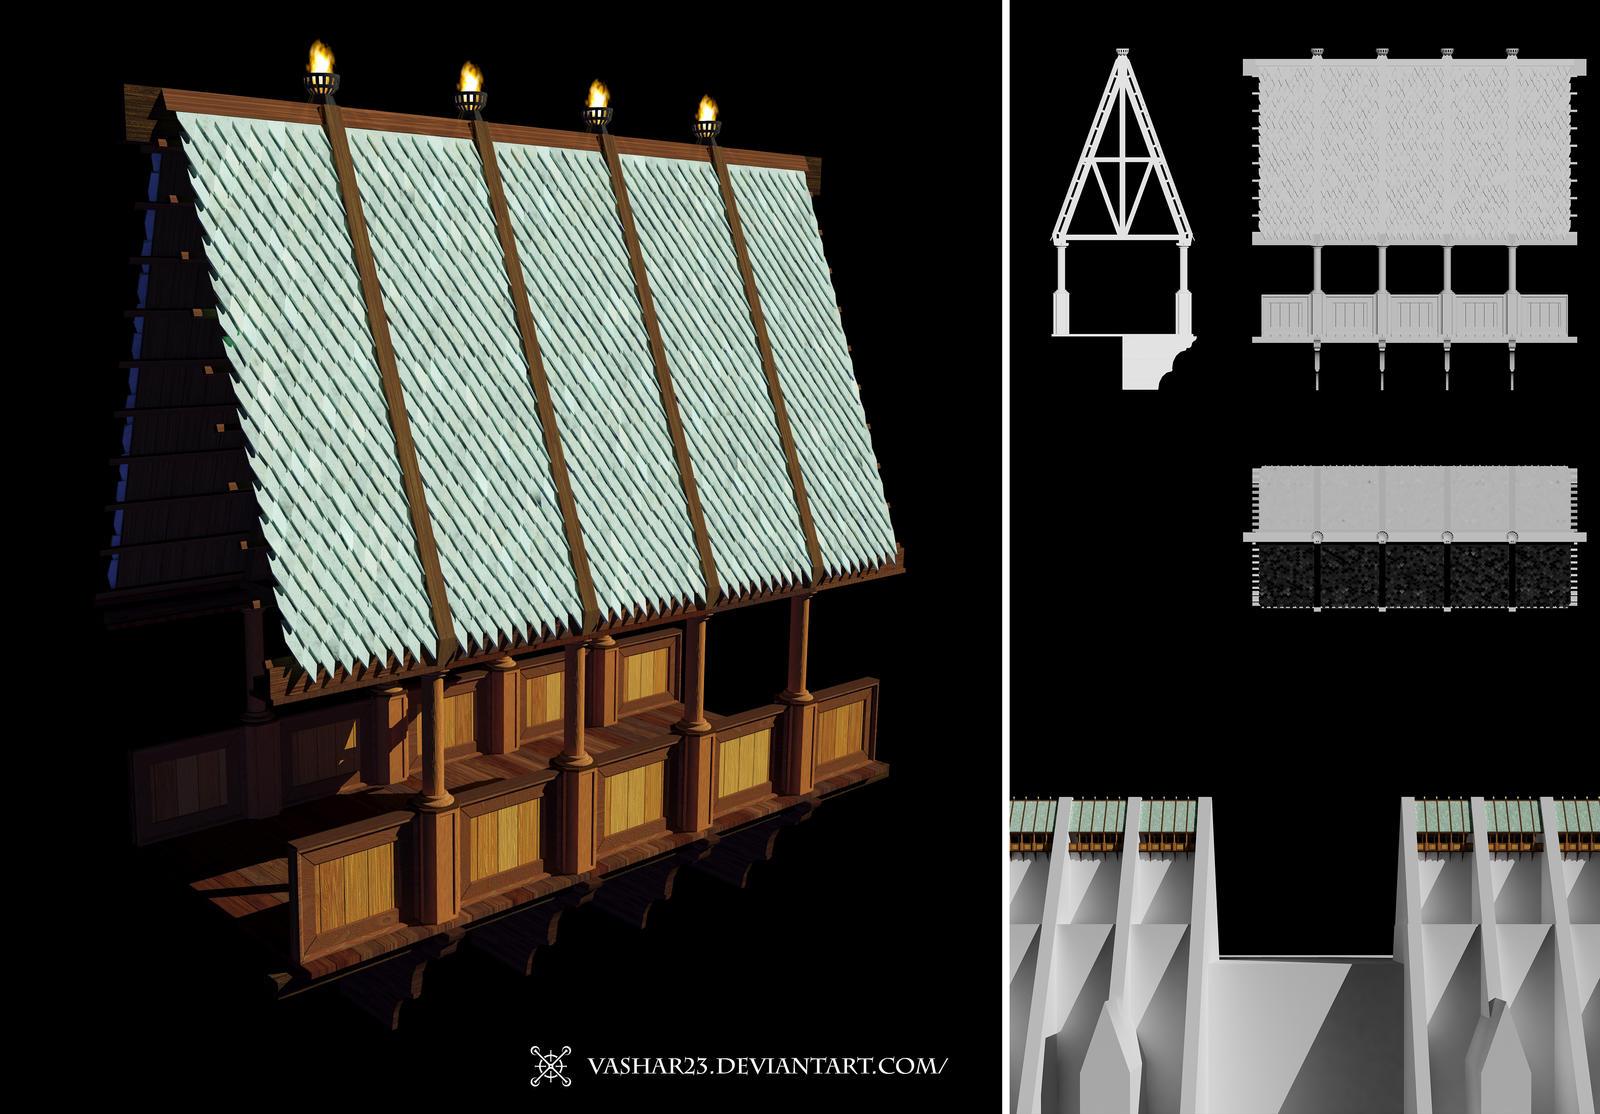 griphus___city_walls_study__2_by_vashar23-d5yi2to.jpg